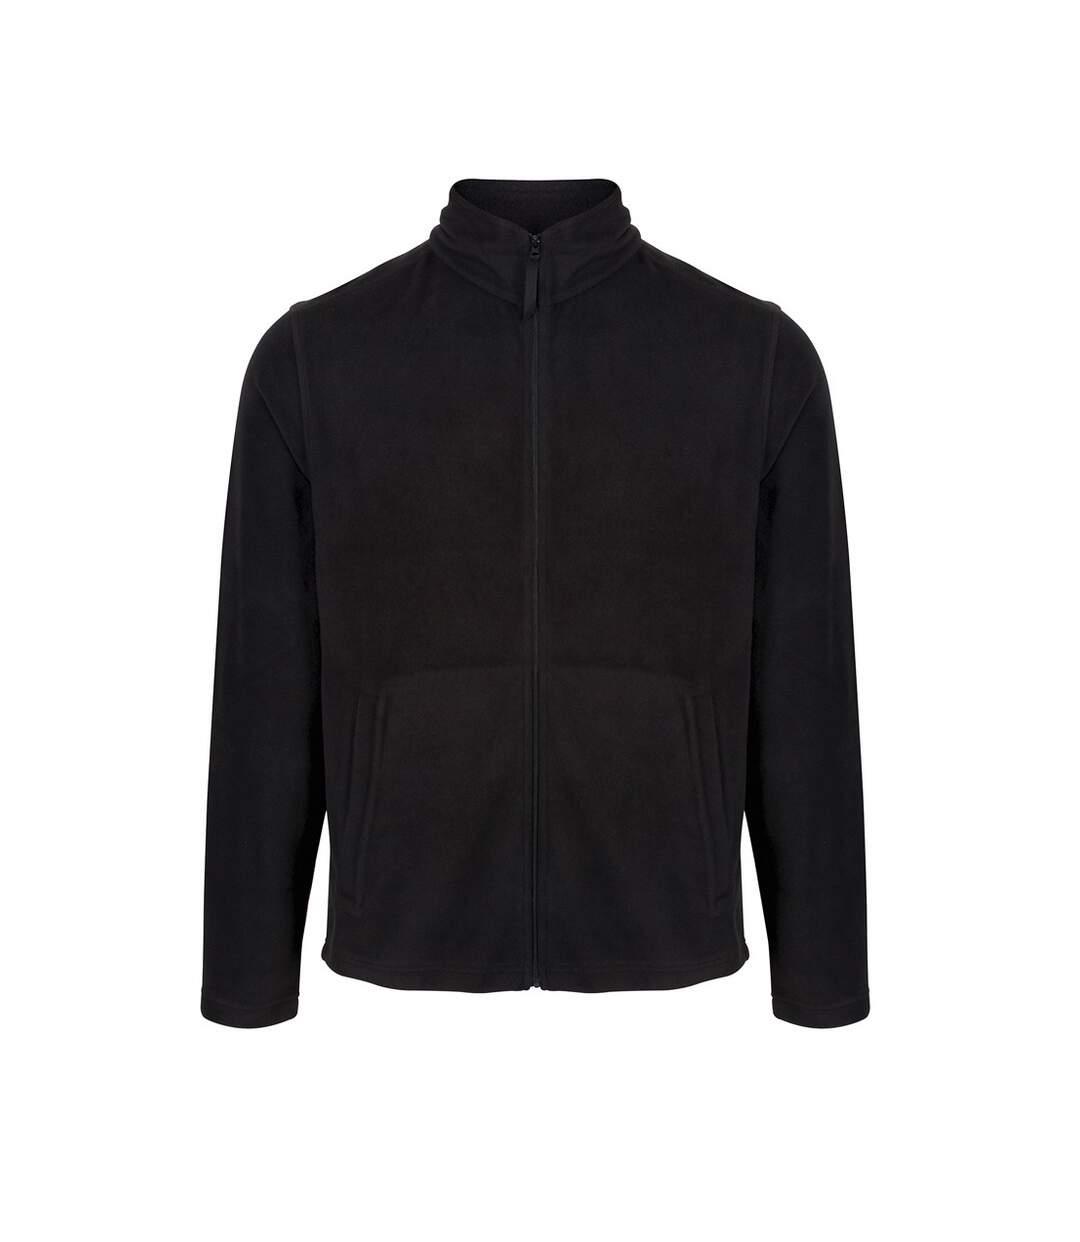 Regatta Professional Mens Classic Micro Fleece Jacket (Black) - UTPC4050